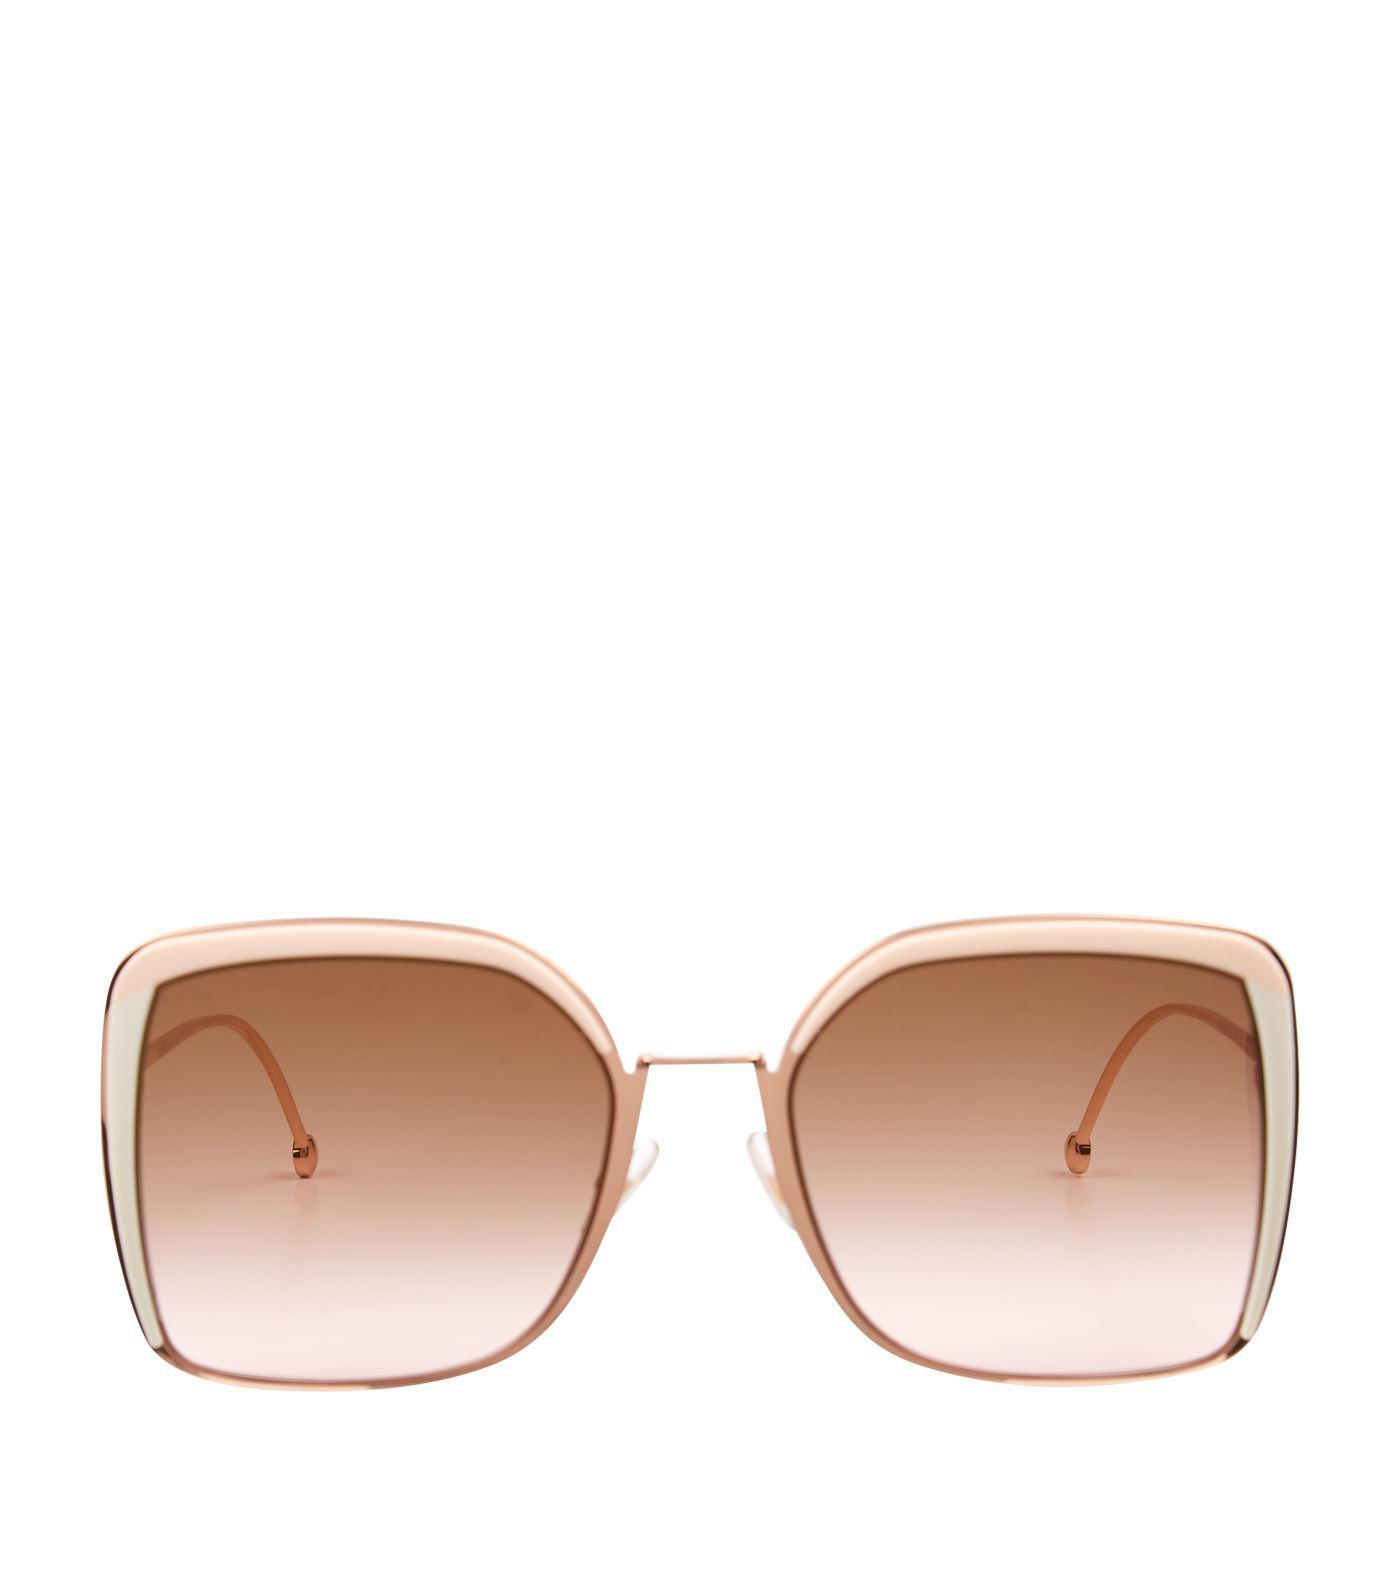 0d4a4d89cea Lyst - Fendi Logo Square Sunglasses in Brown